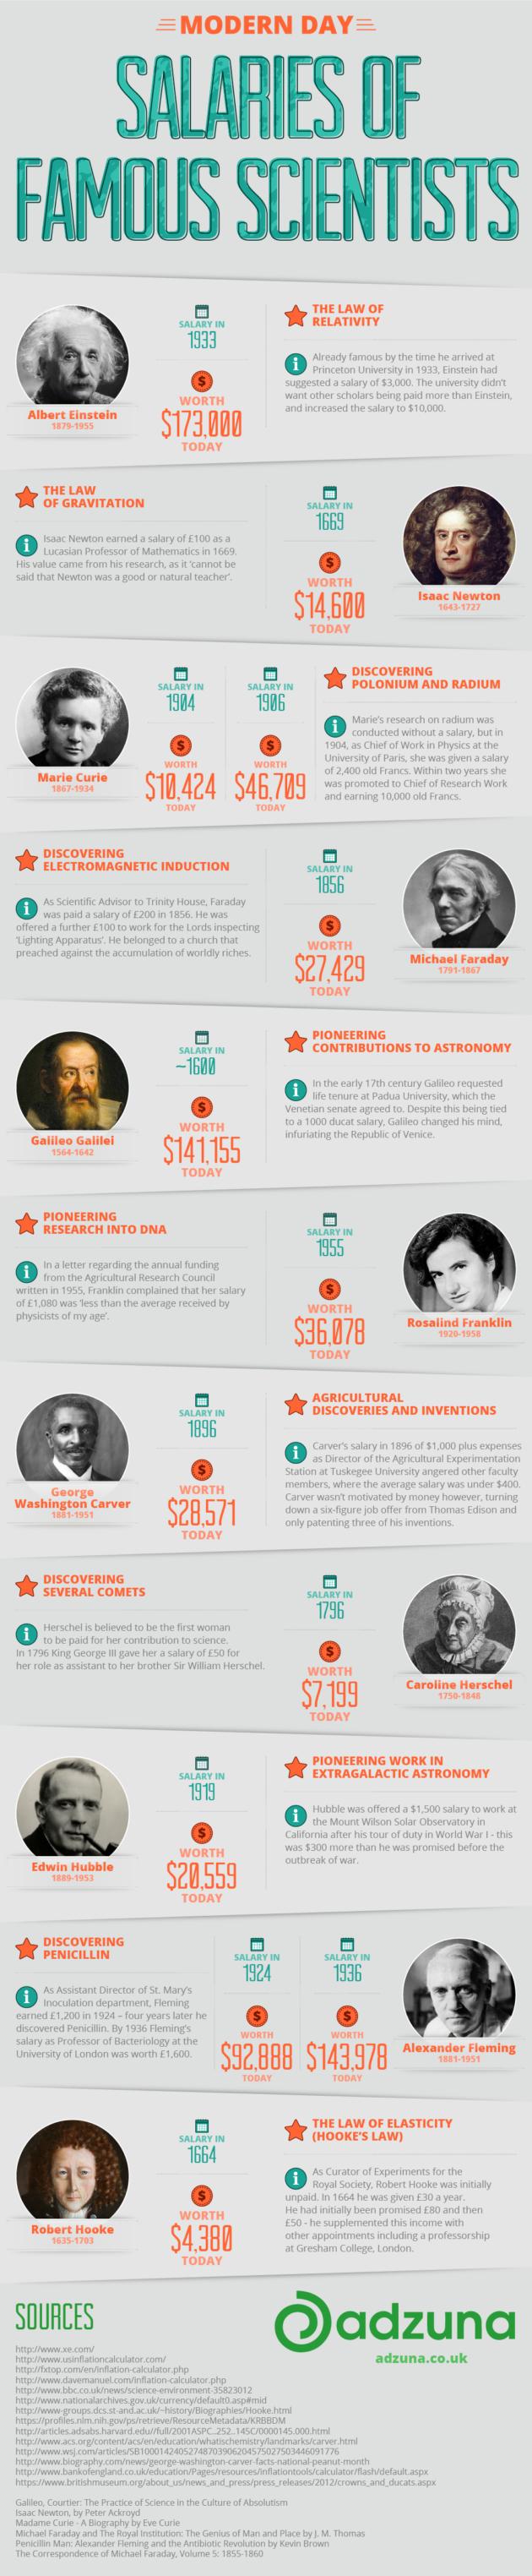 Image: Scientists' salaries